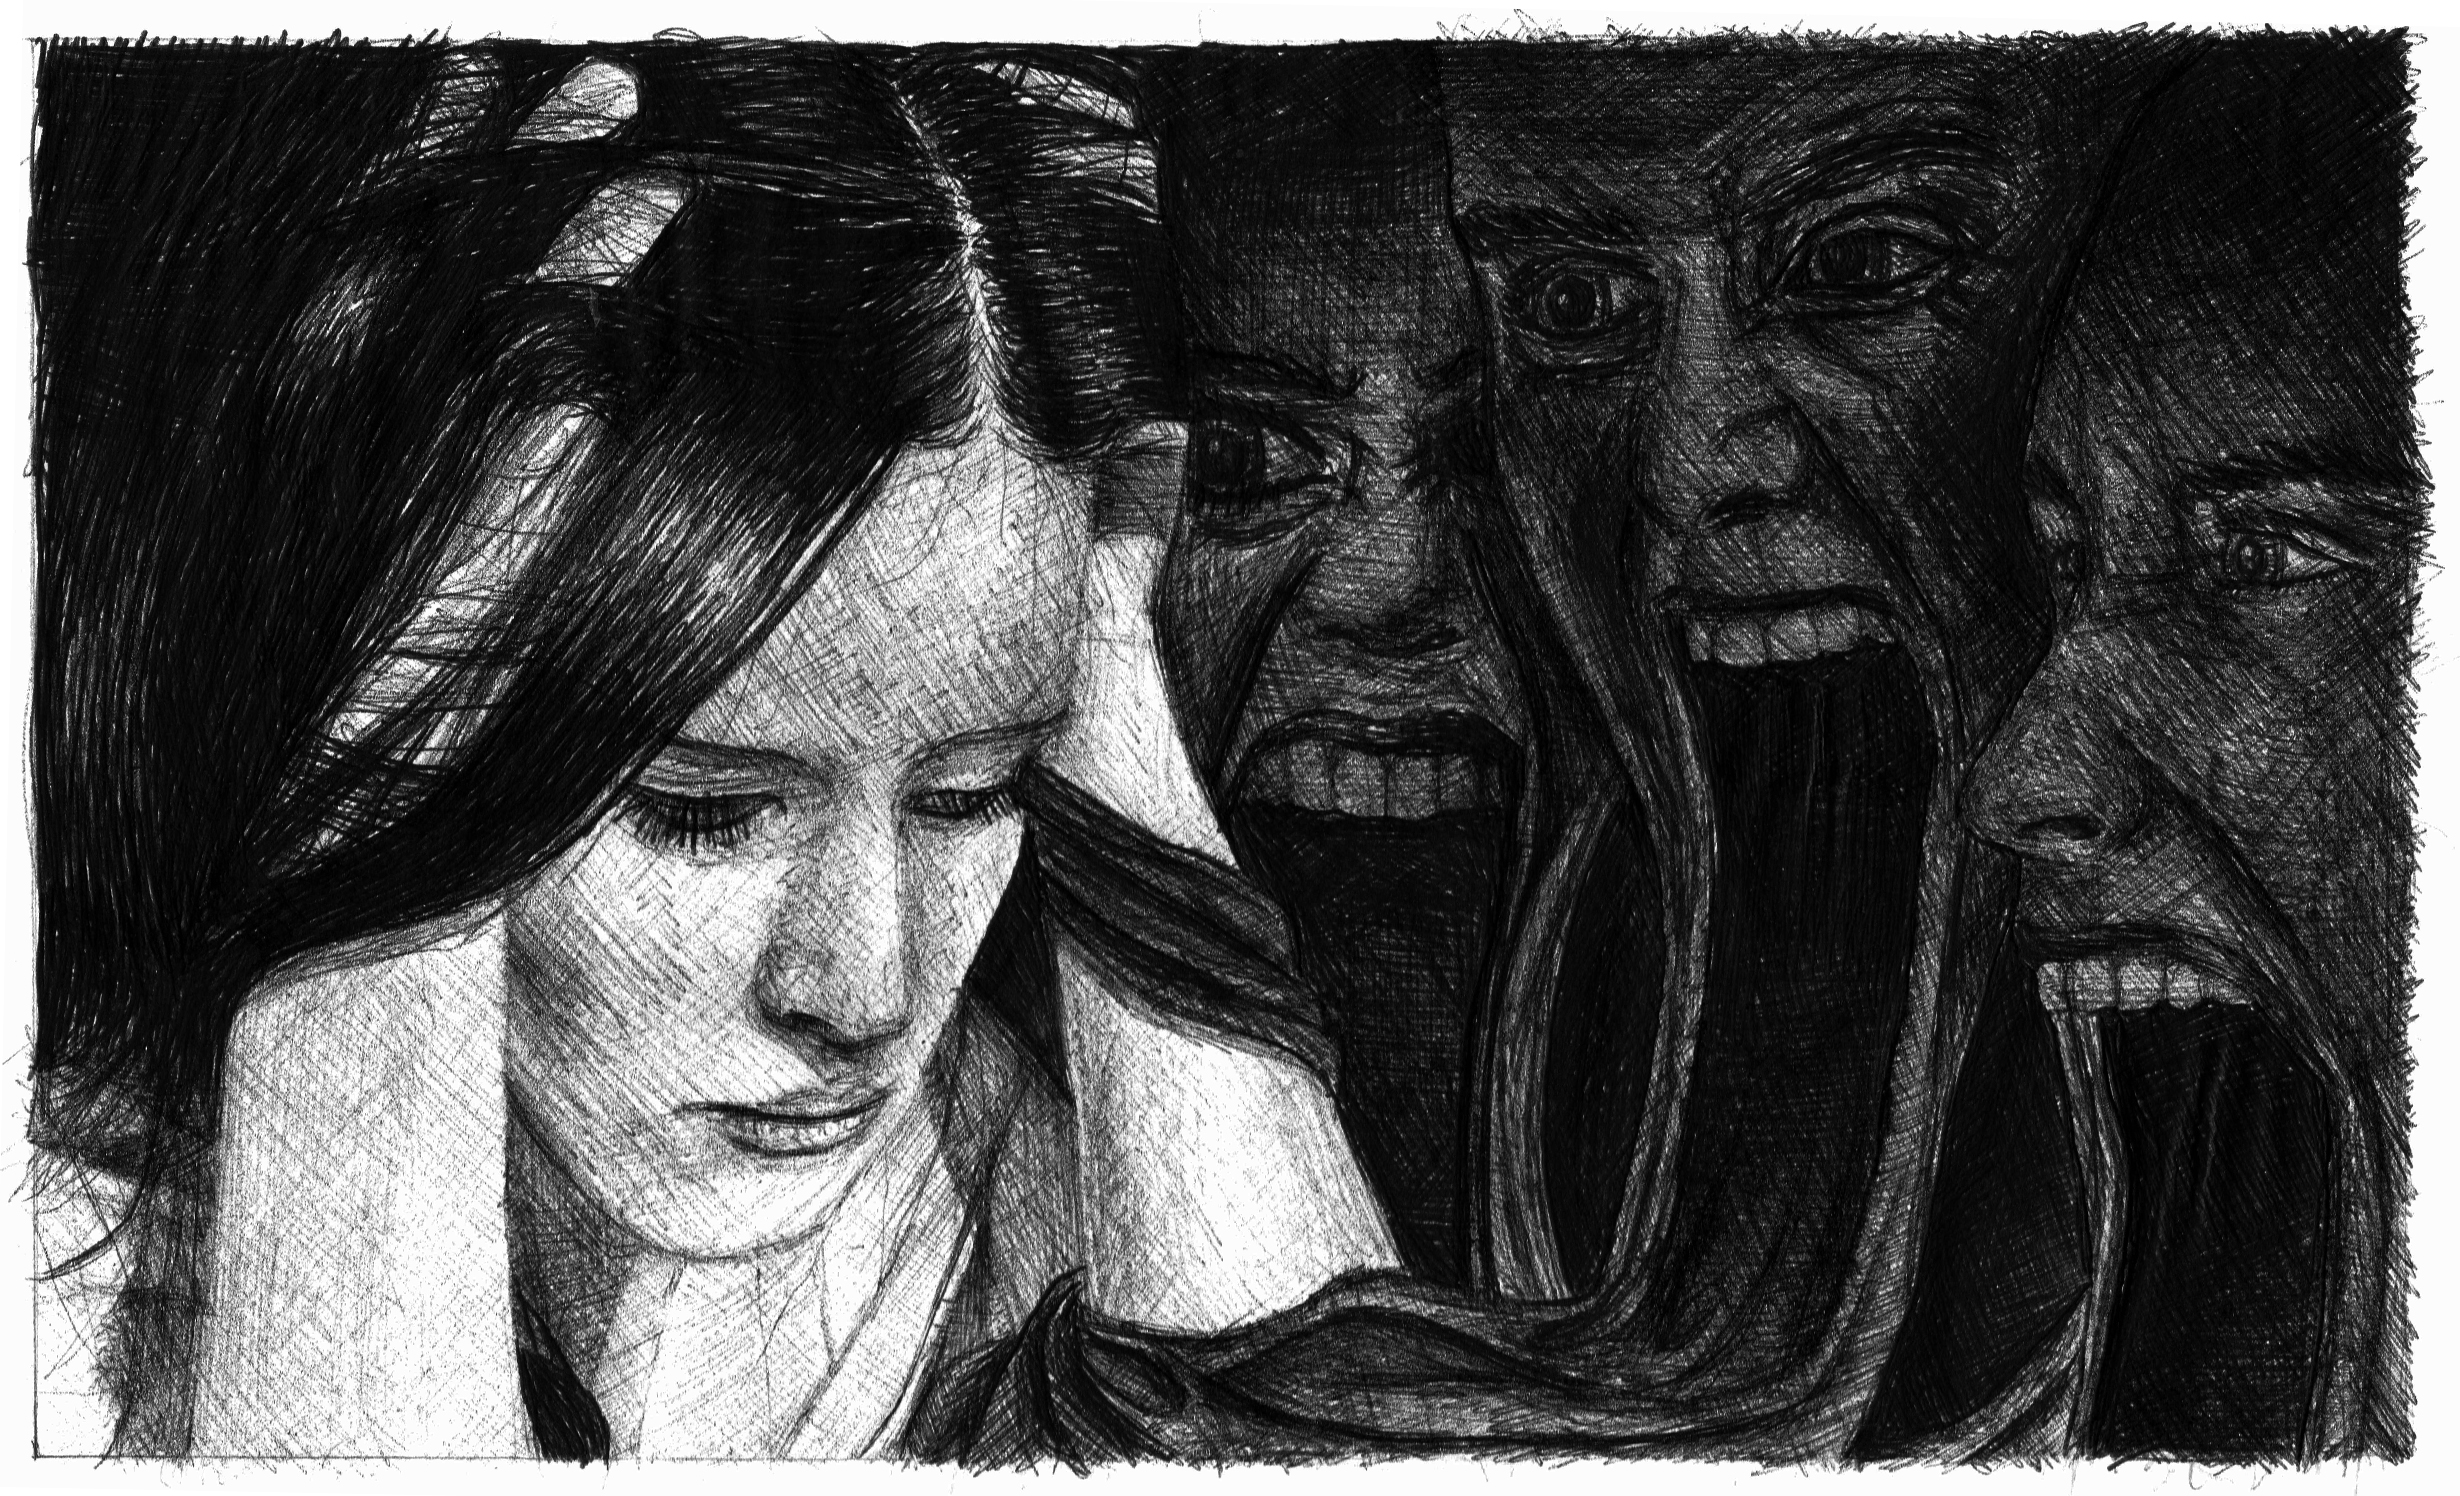 schizophrenia - photo #29